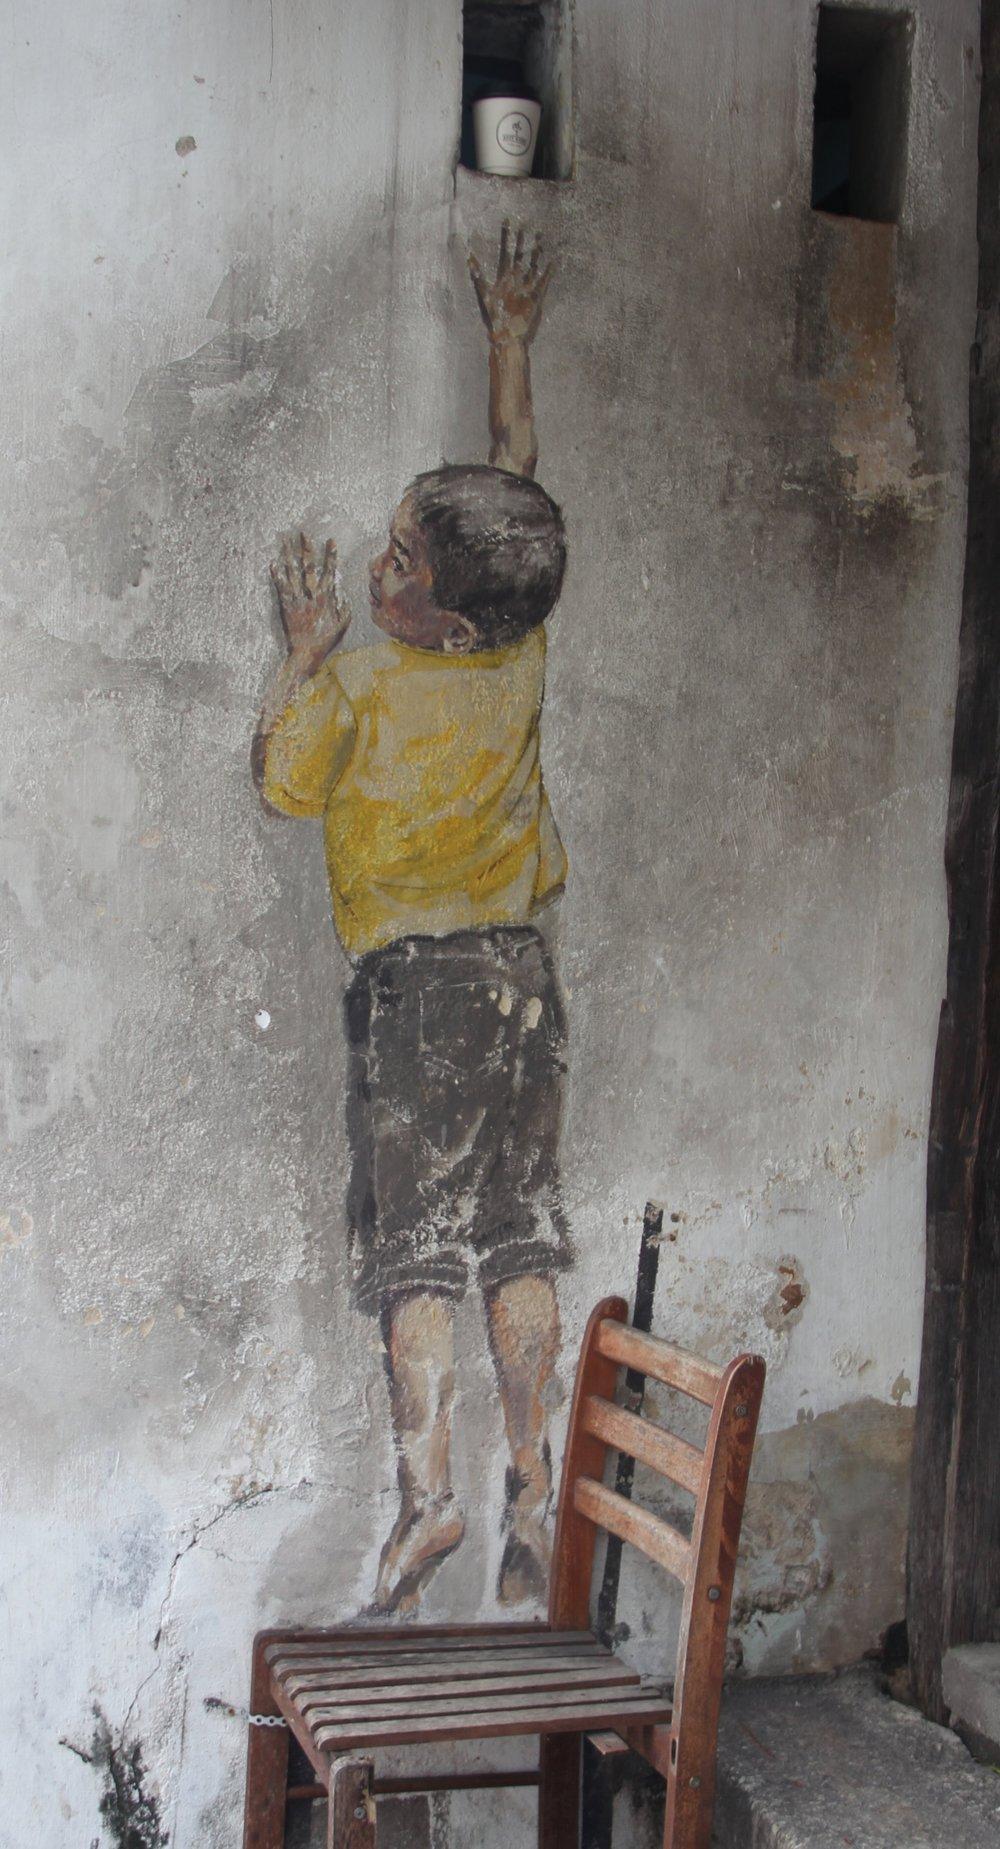 Boy on a chair - A boy reaching for his treasure